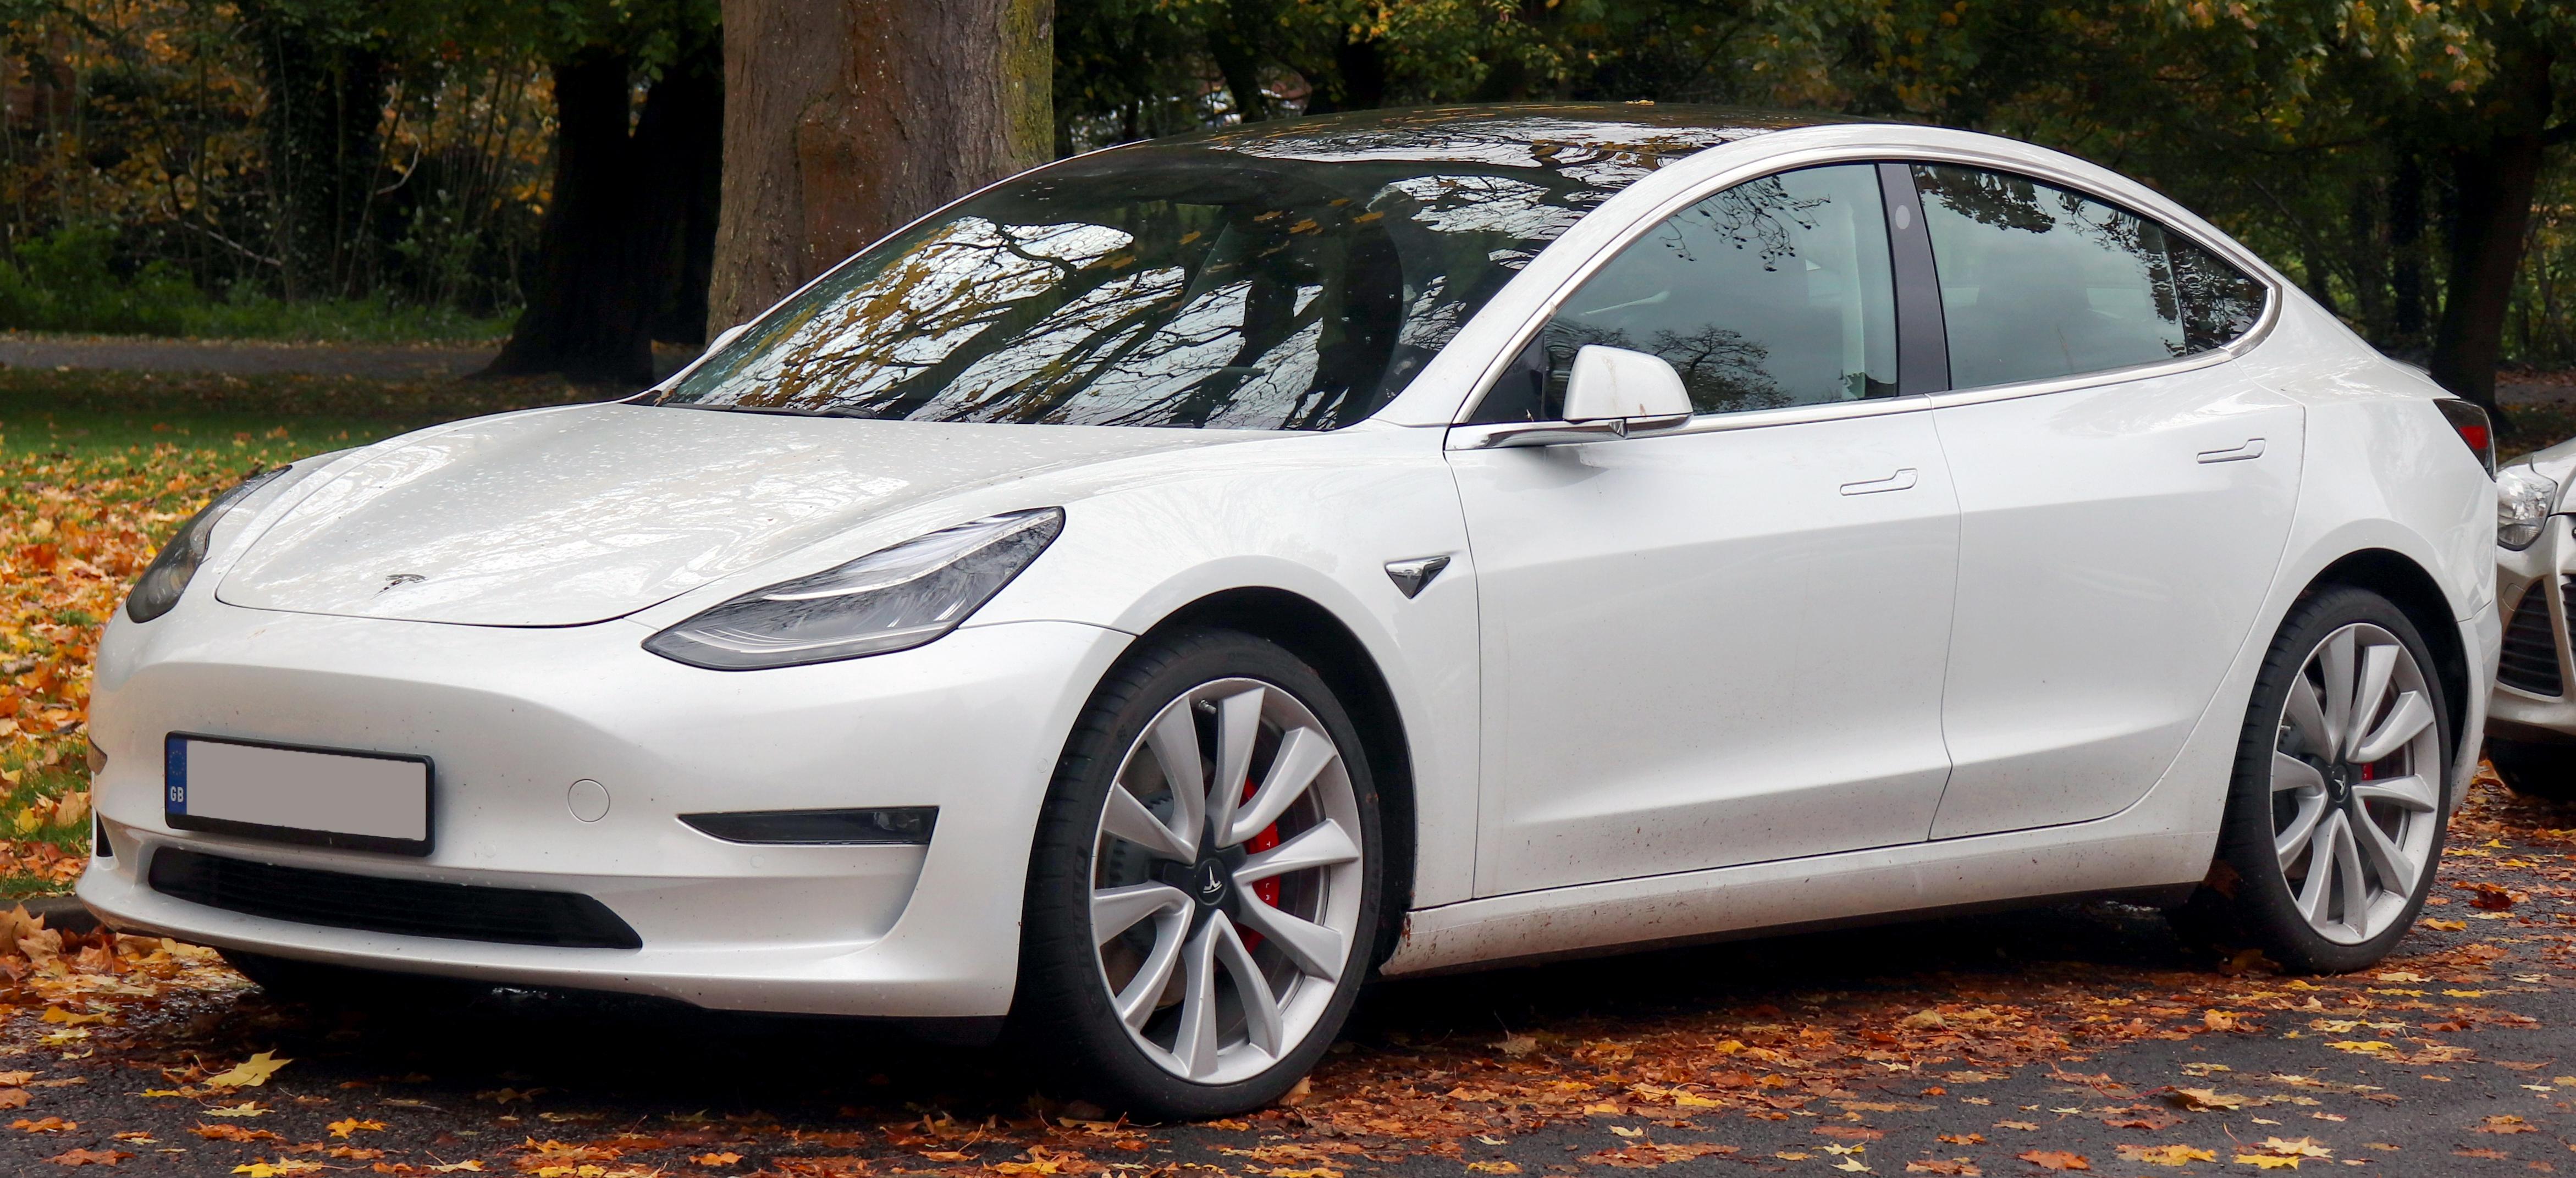 Model 3質保期内遭遇動力電池故障,4S傲慢無禮,特斯拉的未來怎麽走